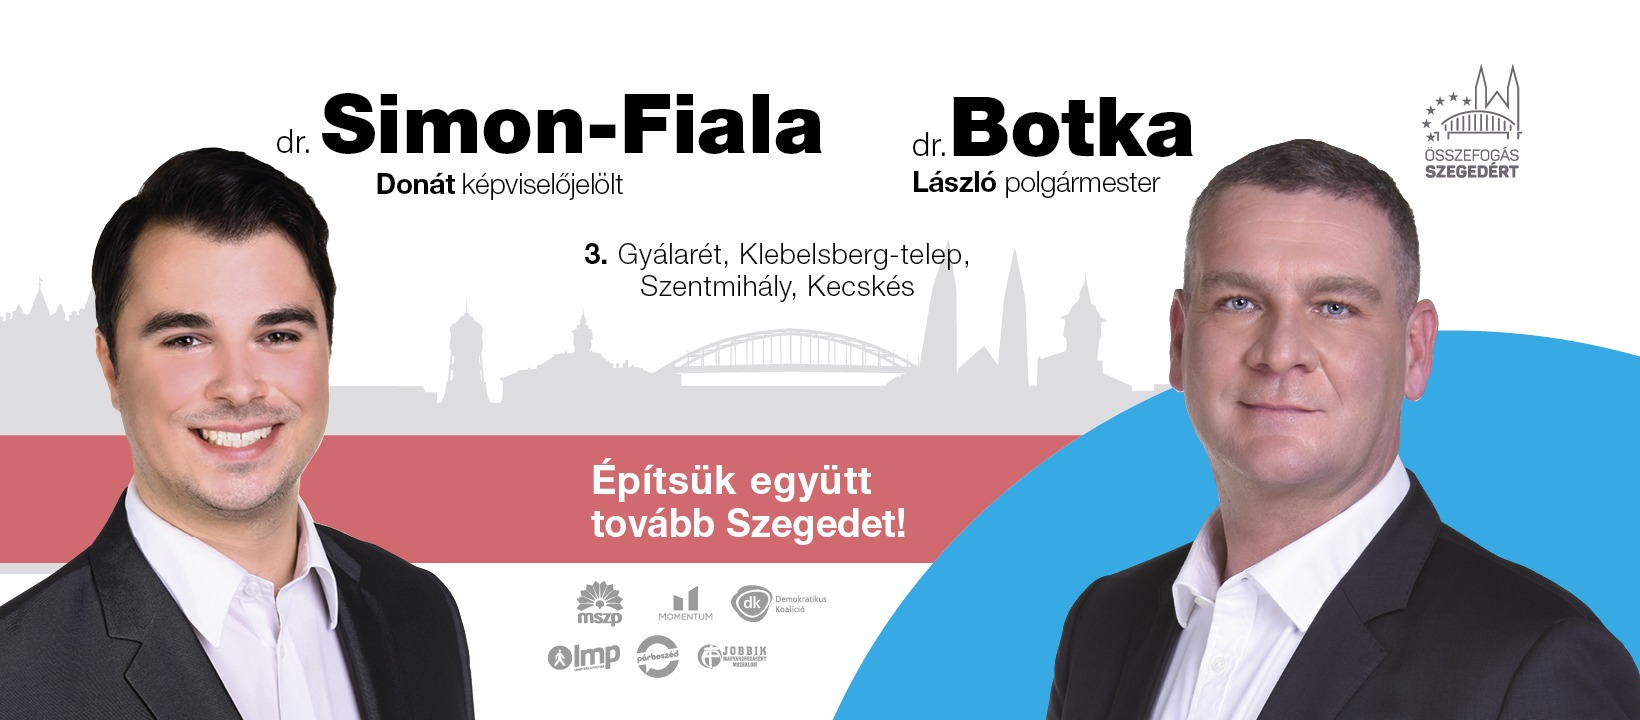 dr. Simon-Fiala Donát